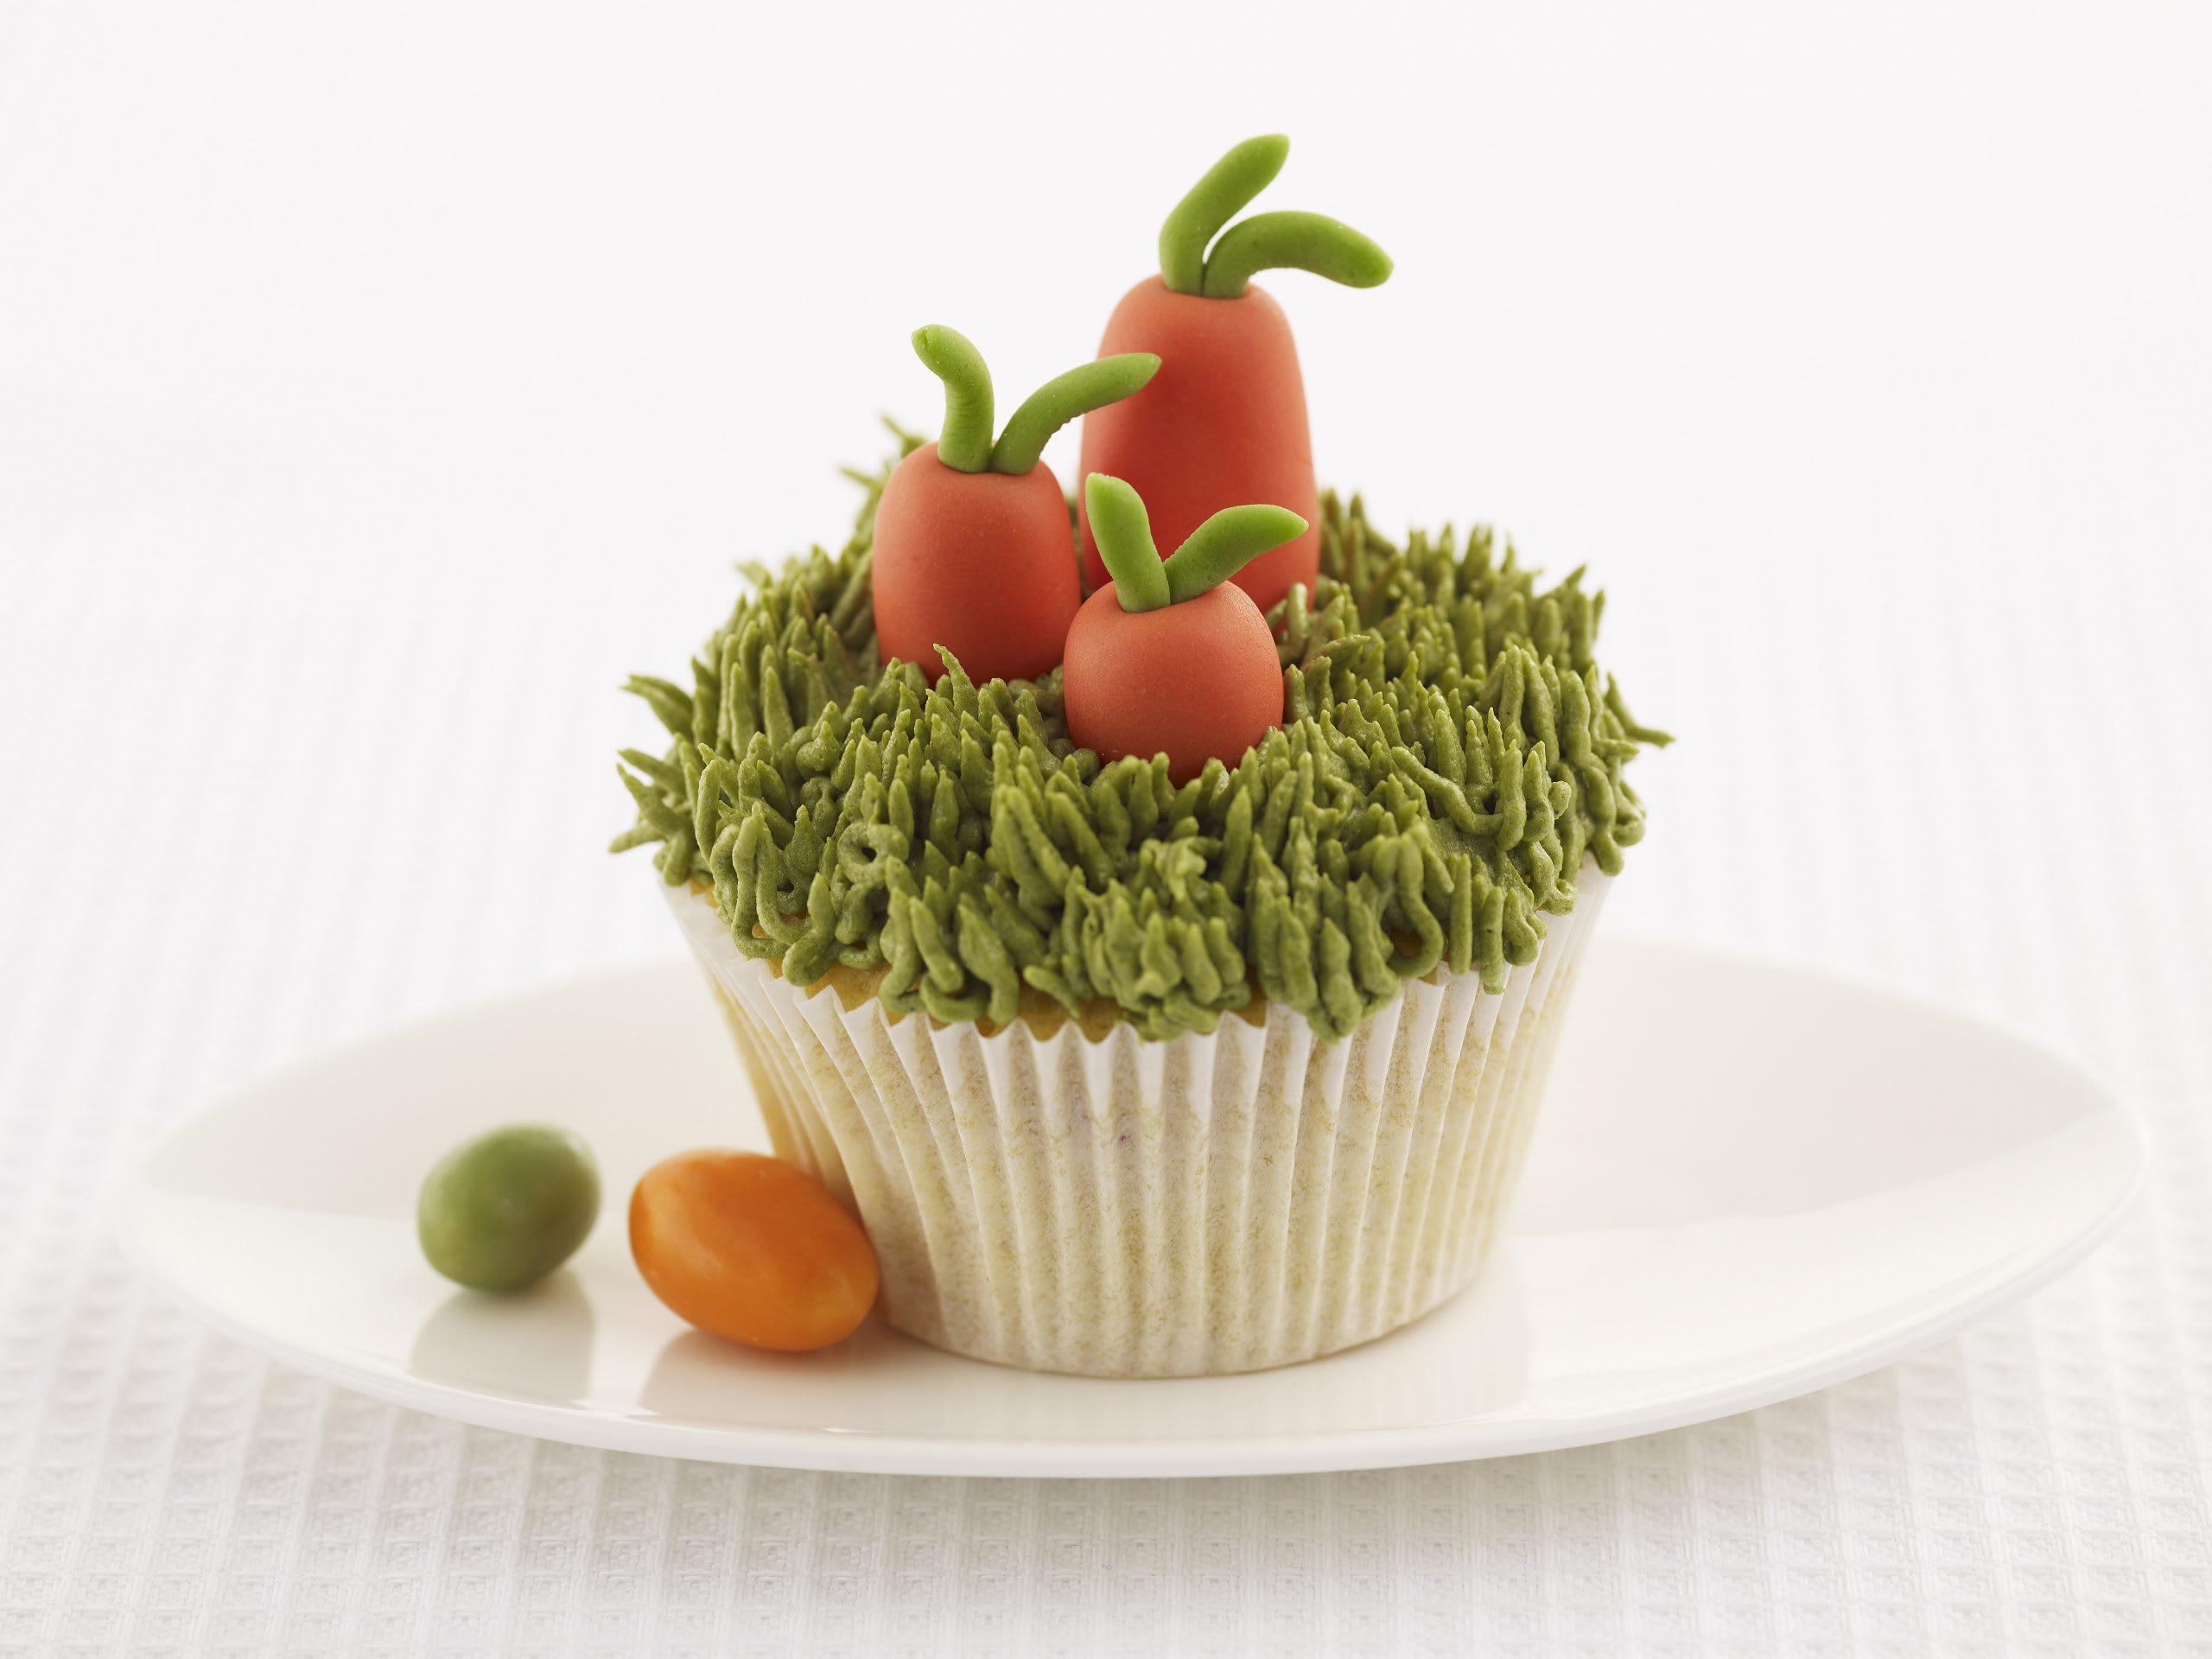 Cupcake Rüebli